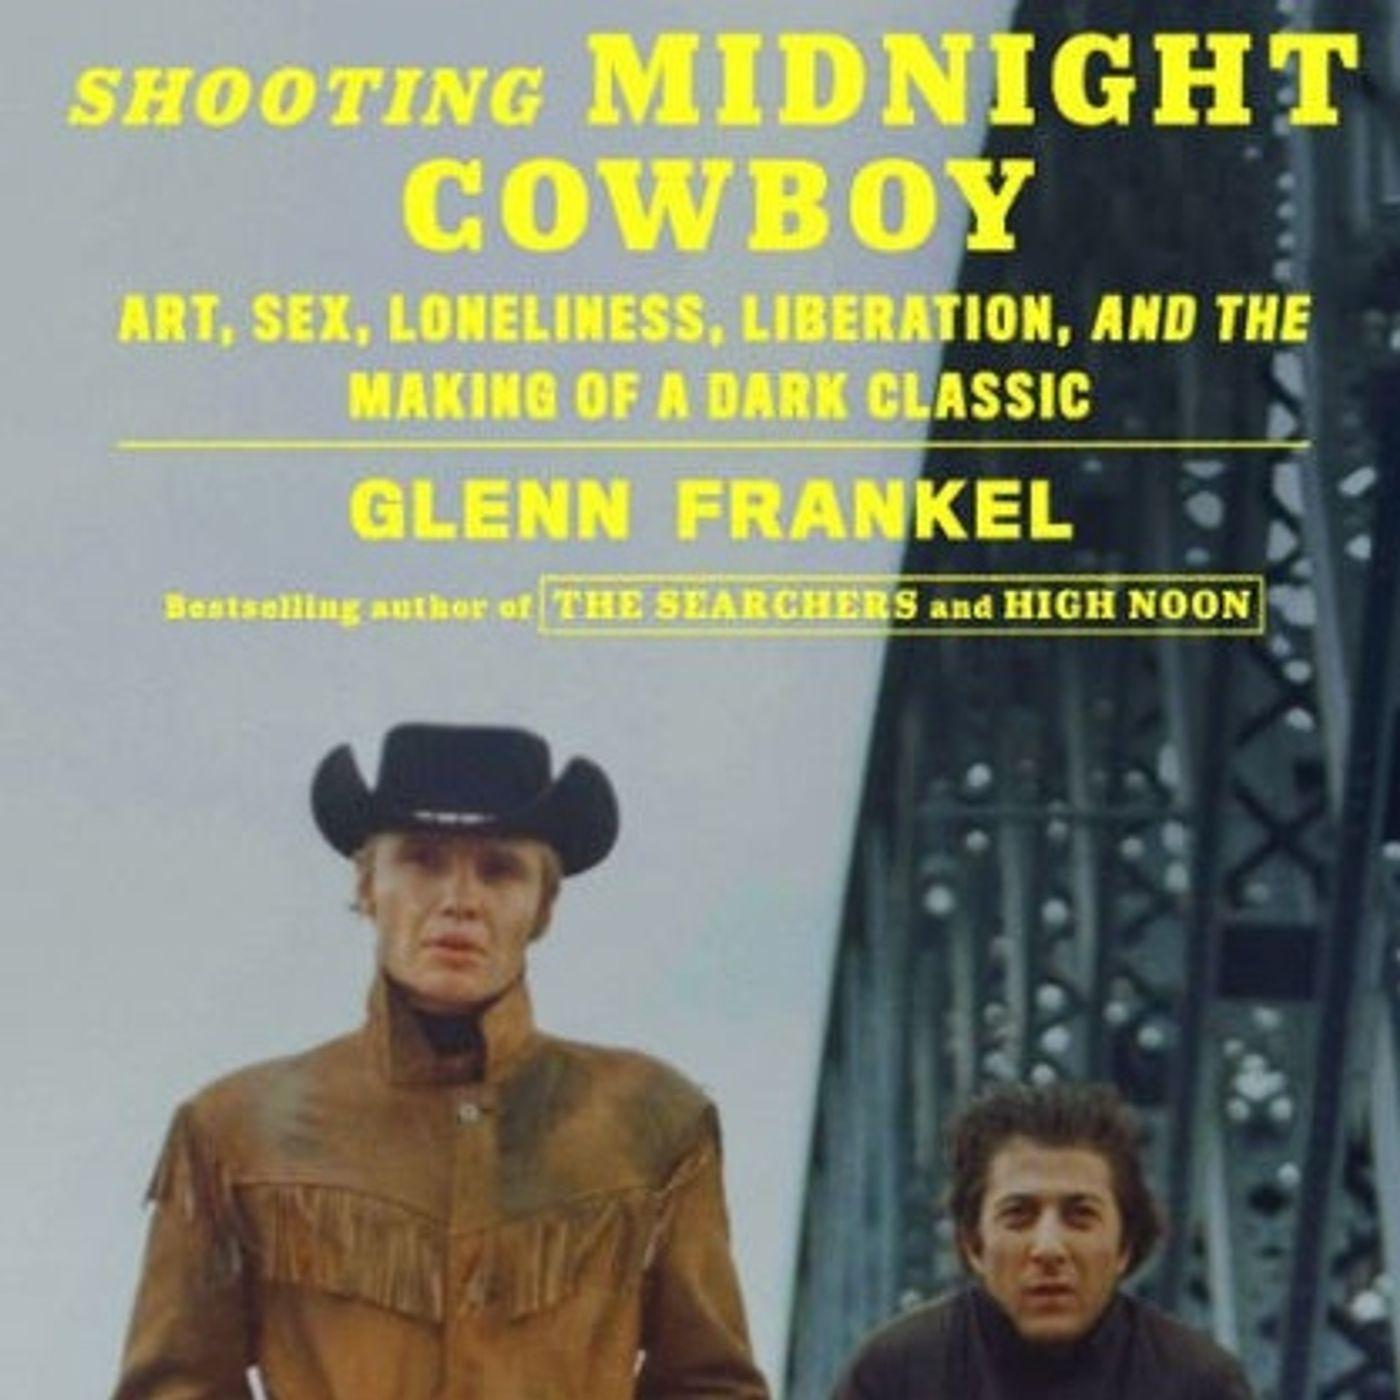 Glenn Frankel Releases The Book Shooting Midnight Cowboy